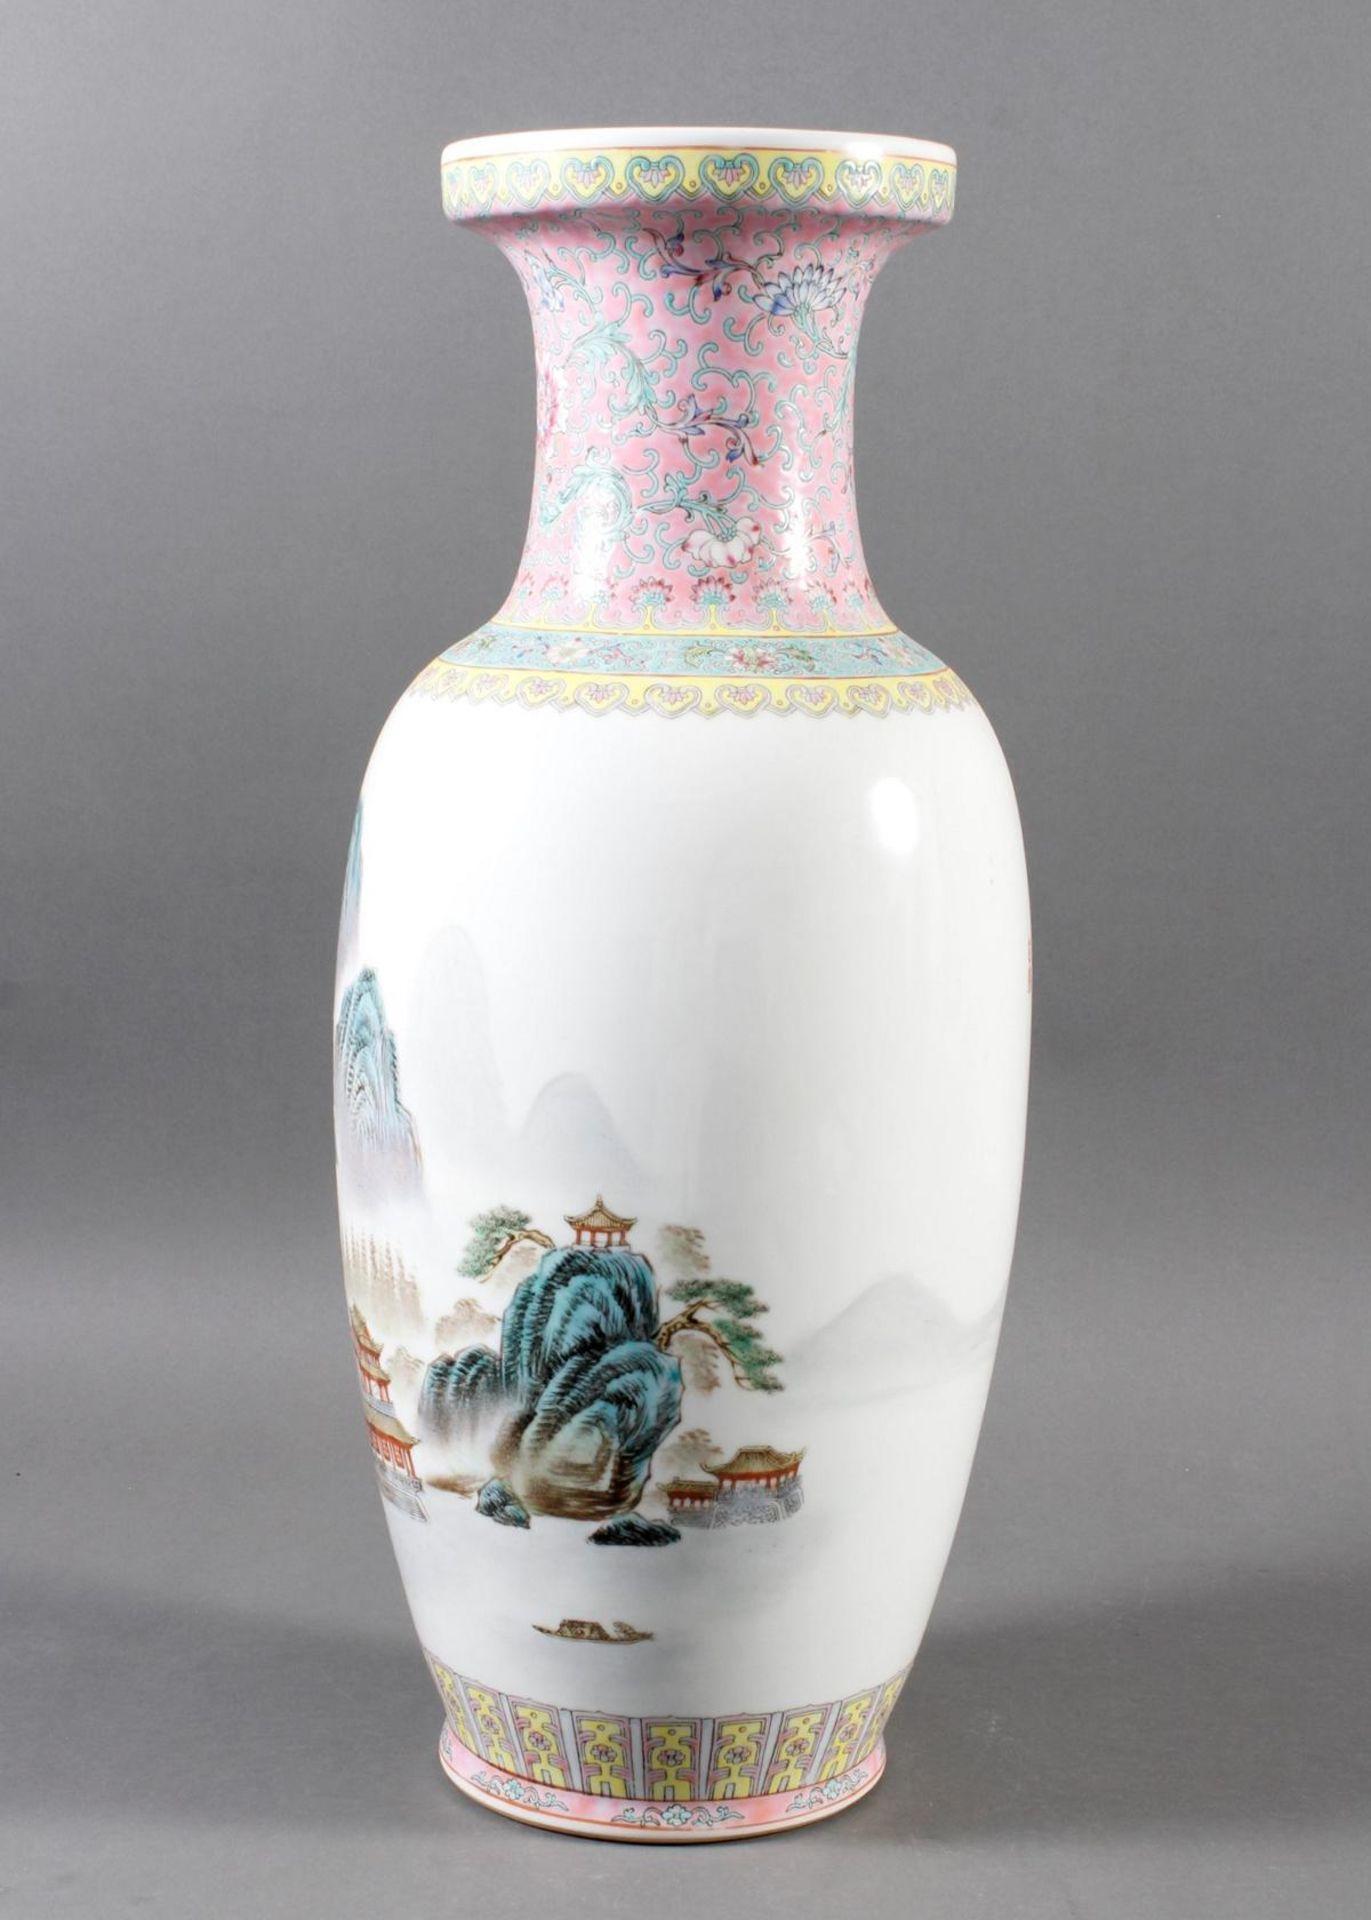 Porzellan Bodenvase, China 20. Jahrhundert - Bild 6 aus 12